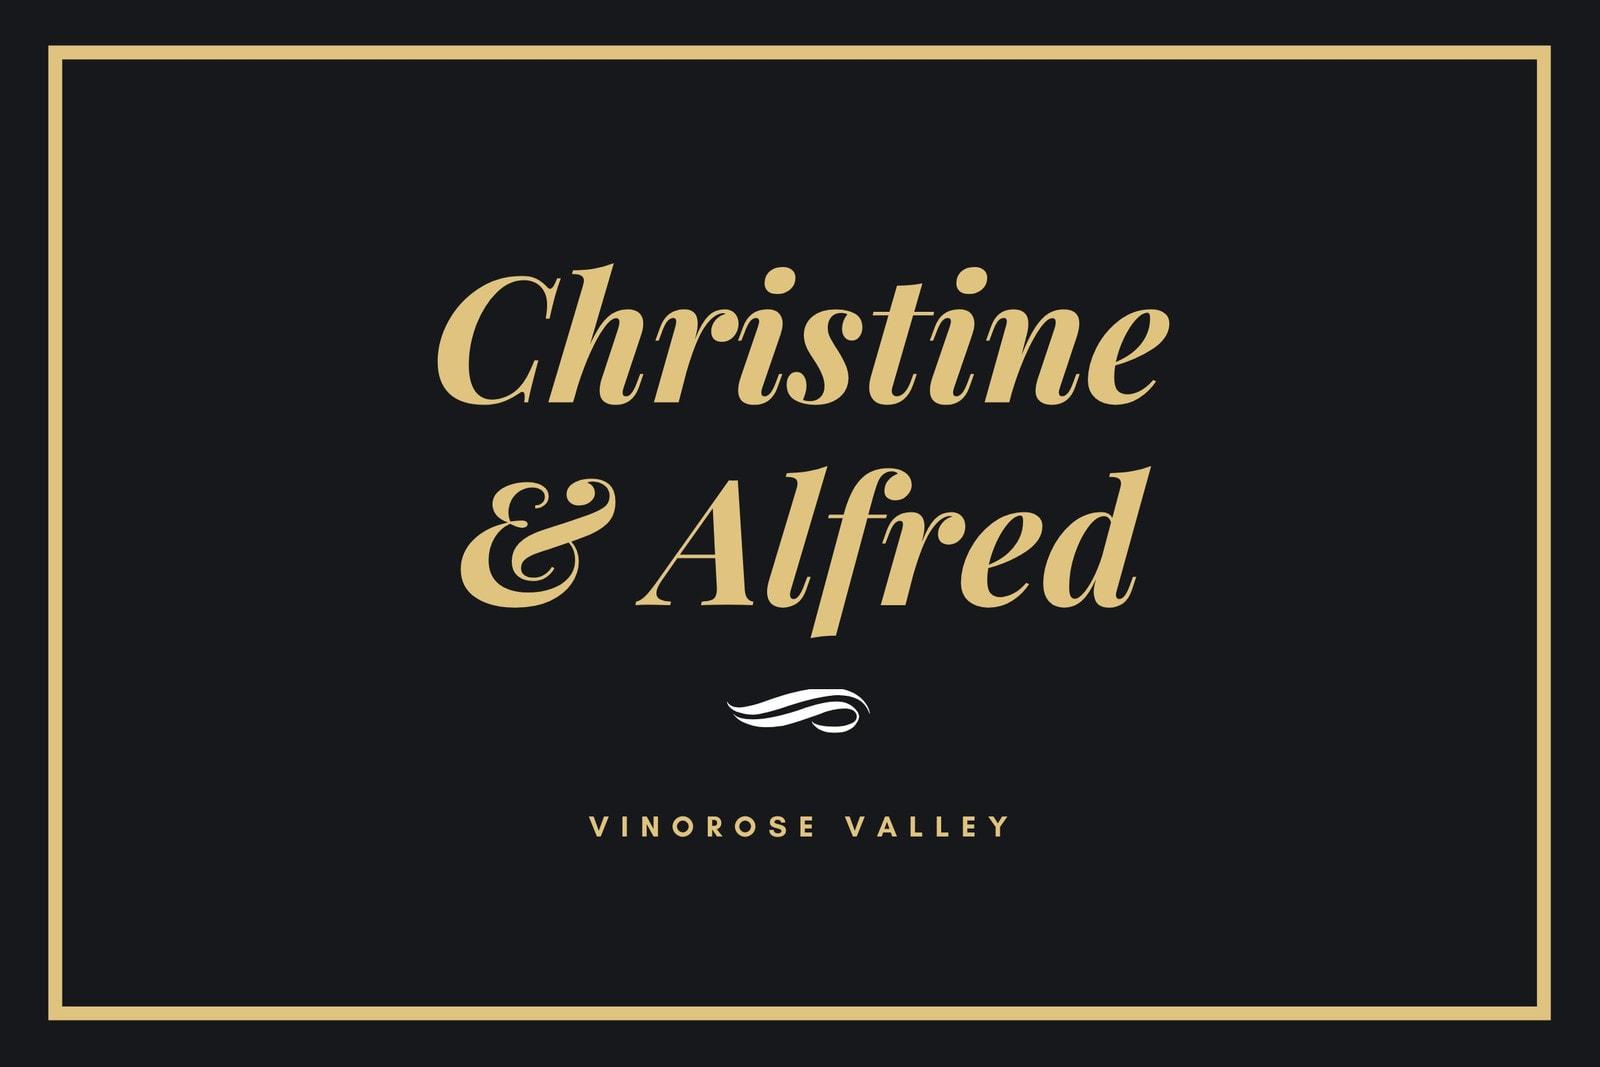 Black and Gold Bordered Wedding Wine Label